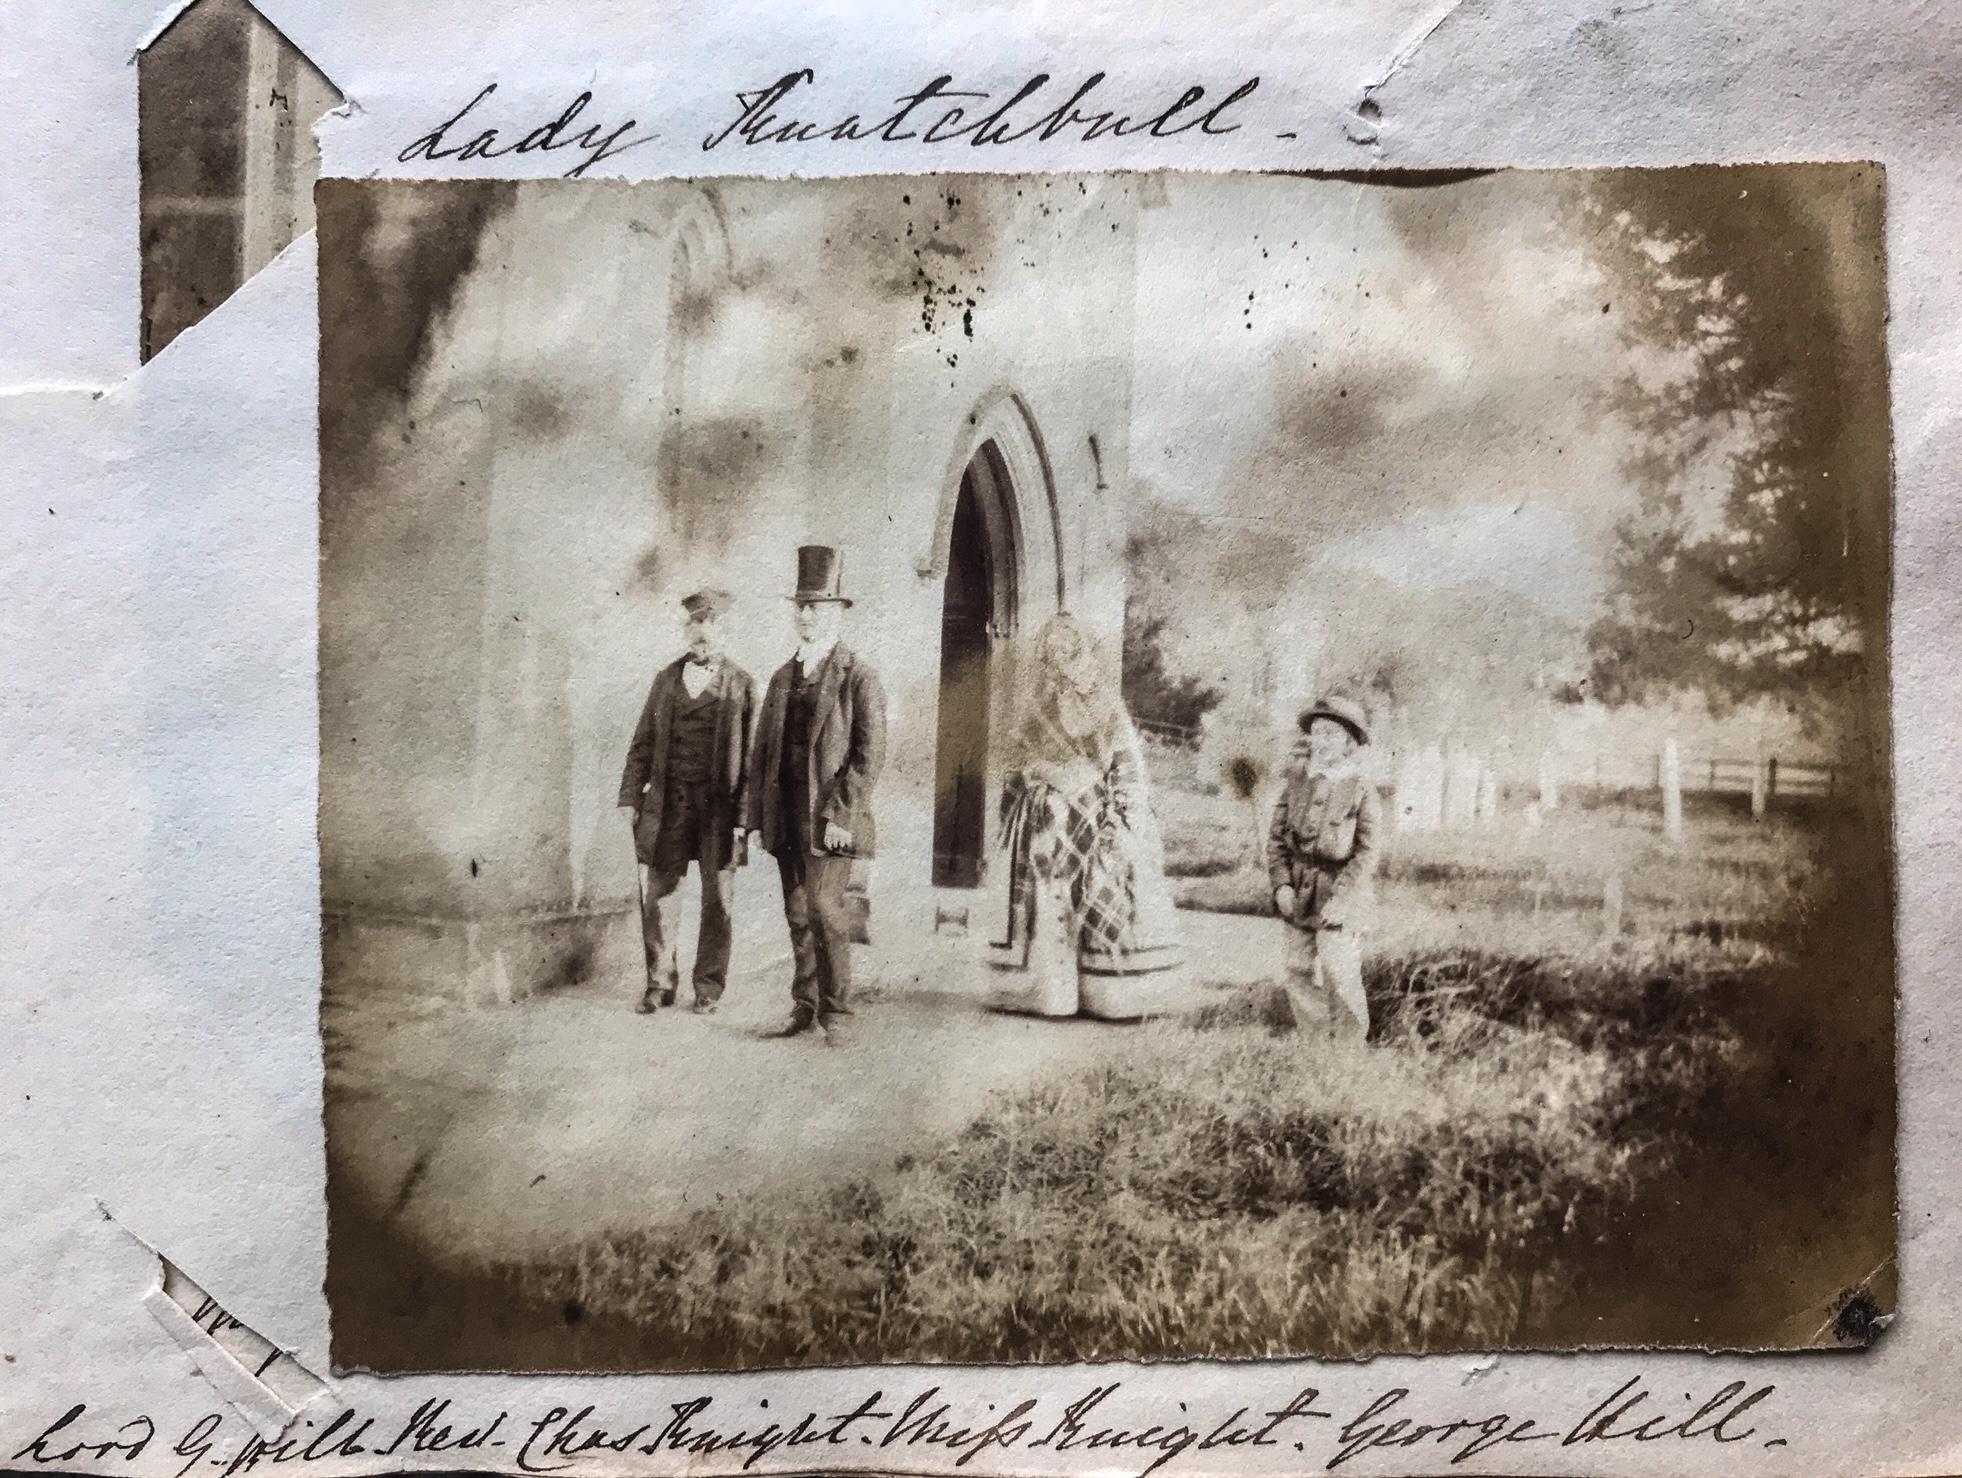 Lord George Hill, Rev. Charles Knight, Miss Marianne Knight & Master George Hill at St. Nicholas church, Chawton.  Credit: Karen Ievers.